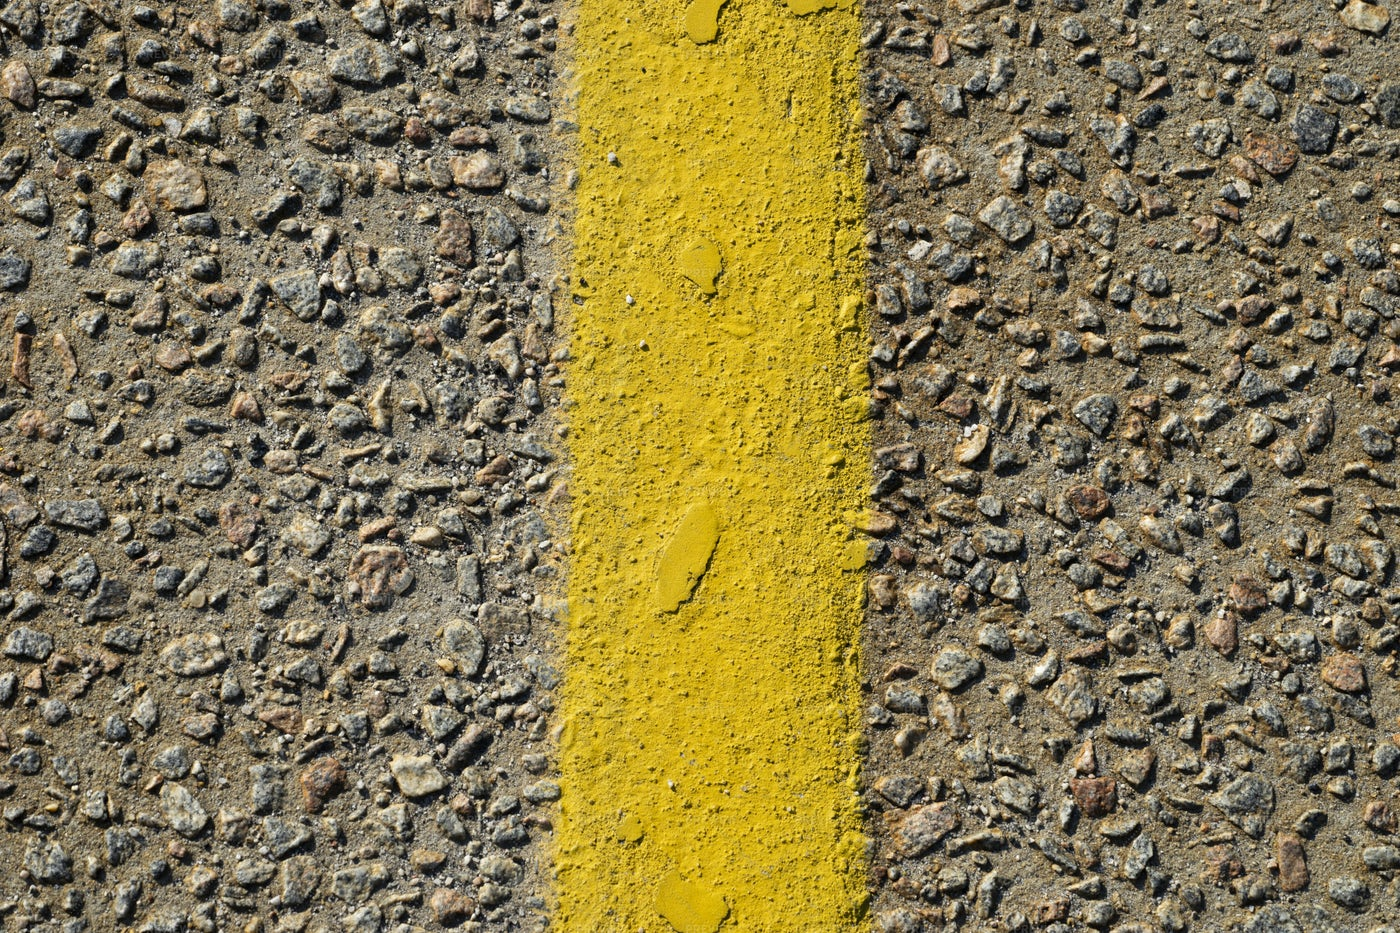 Yellow Paint On Concrete: Stock Photos